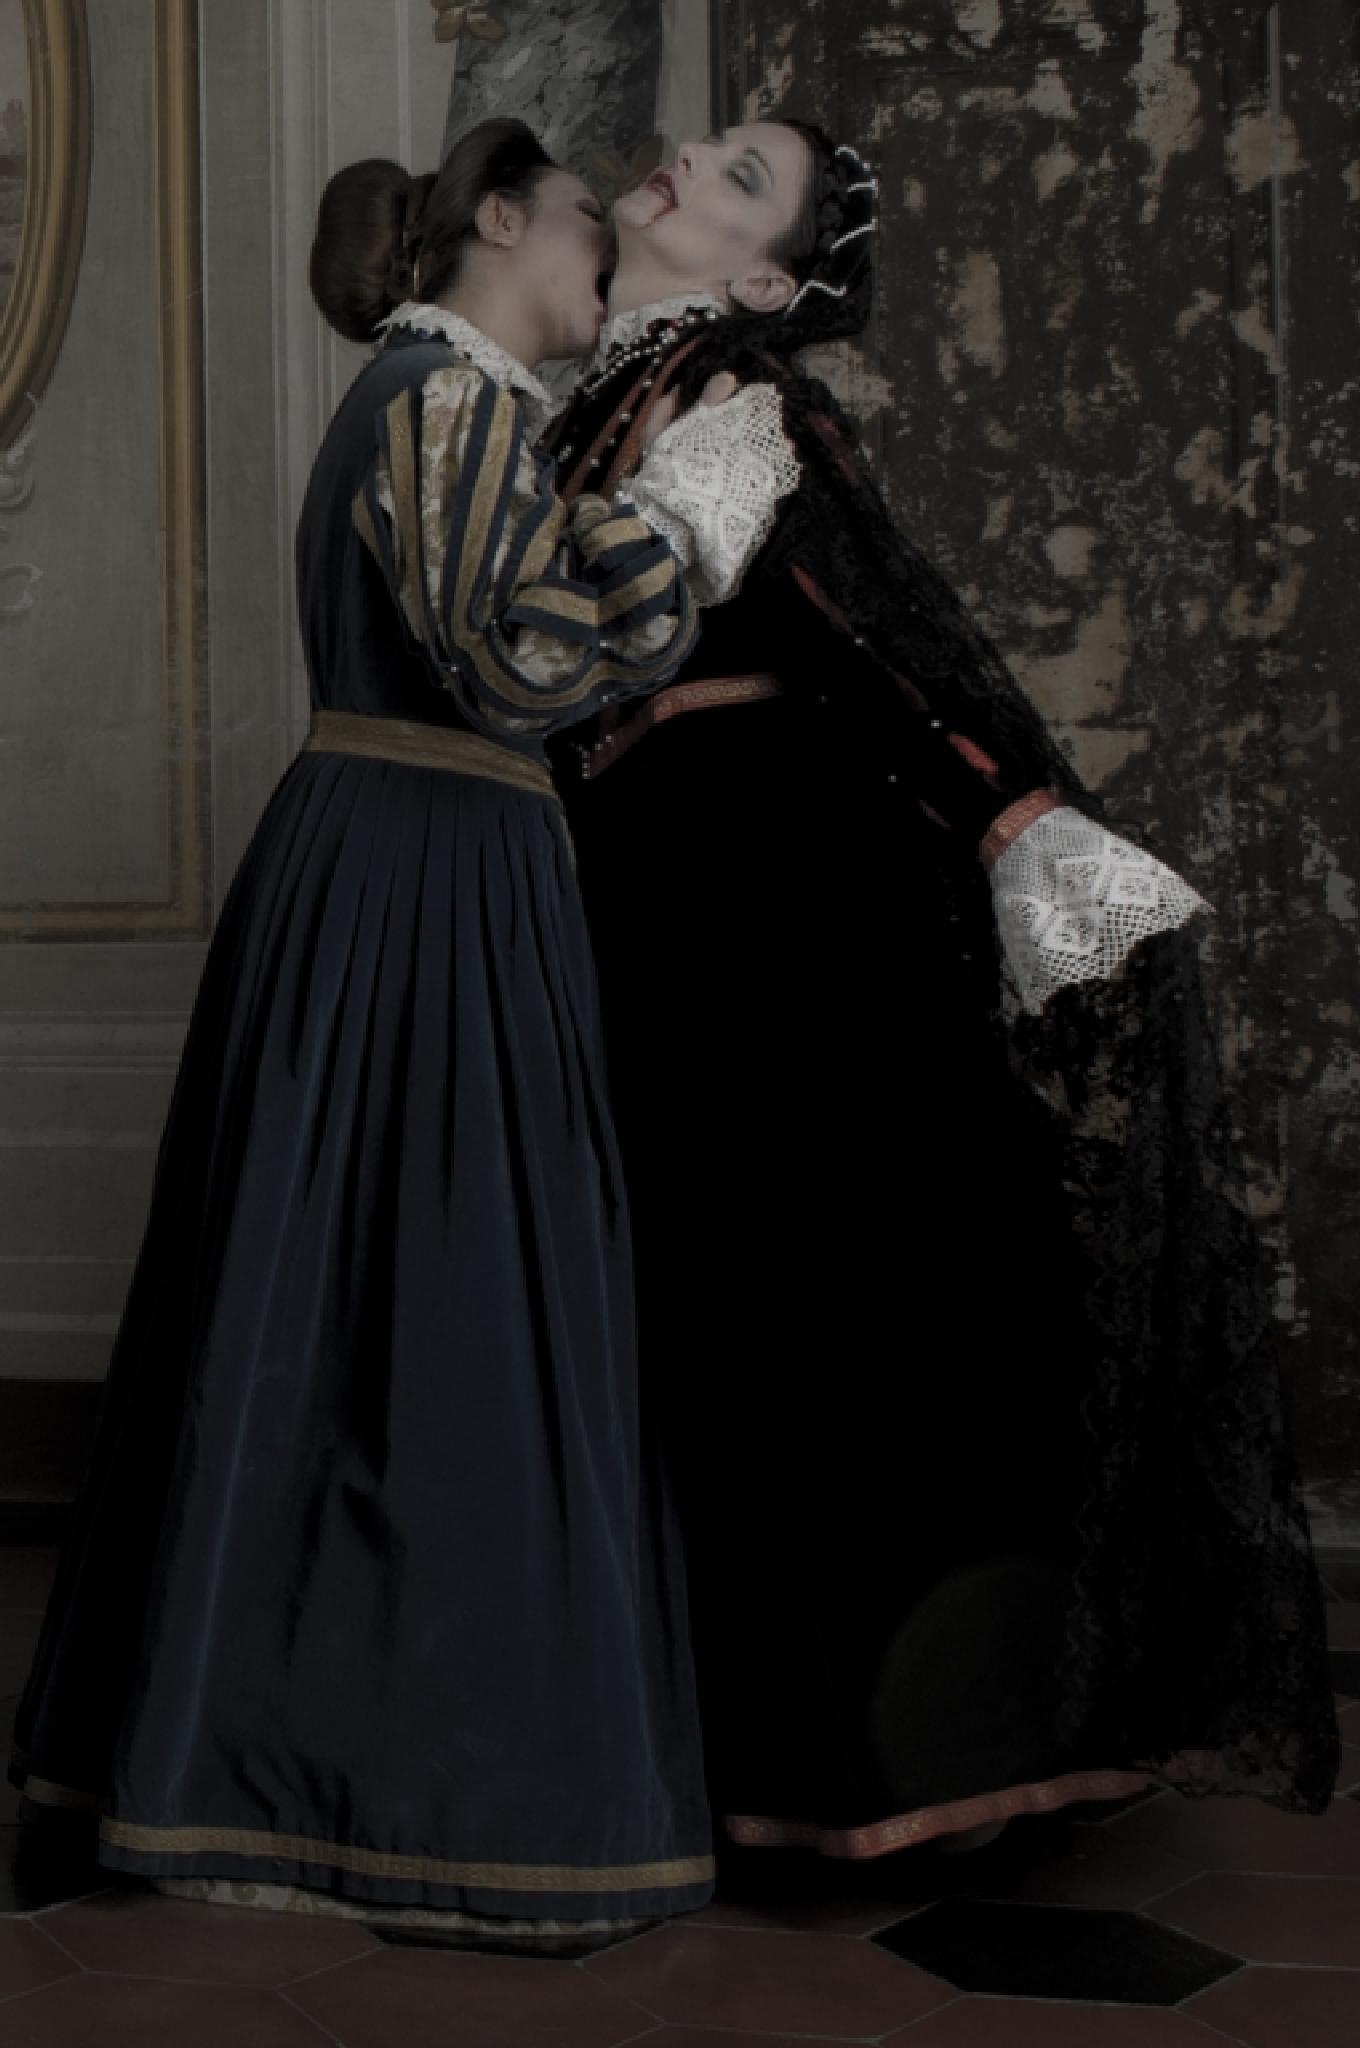 vampire girl by Renato Giustini photographer Passion